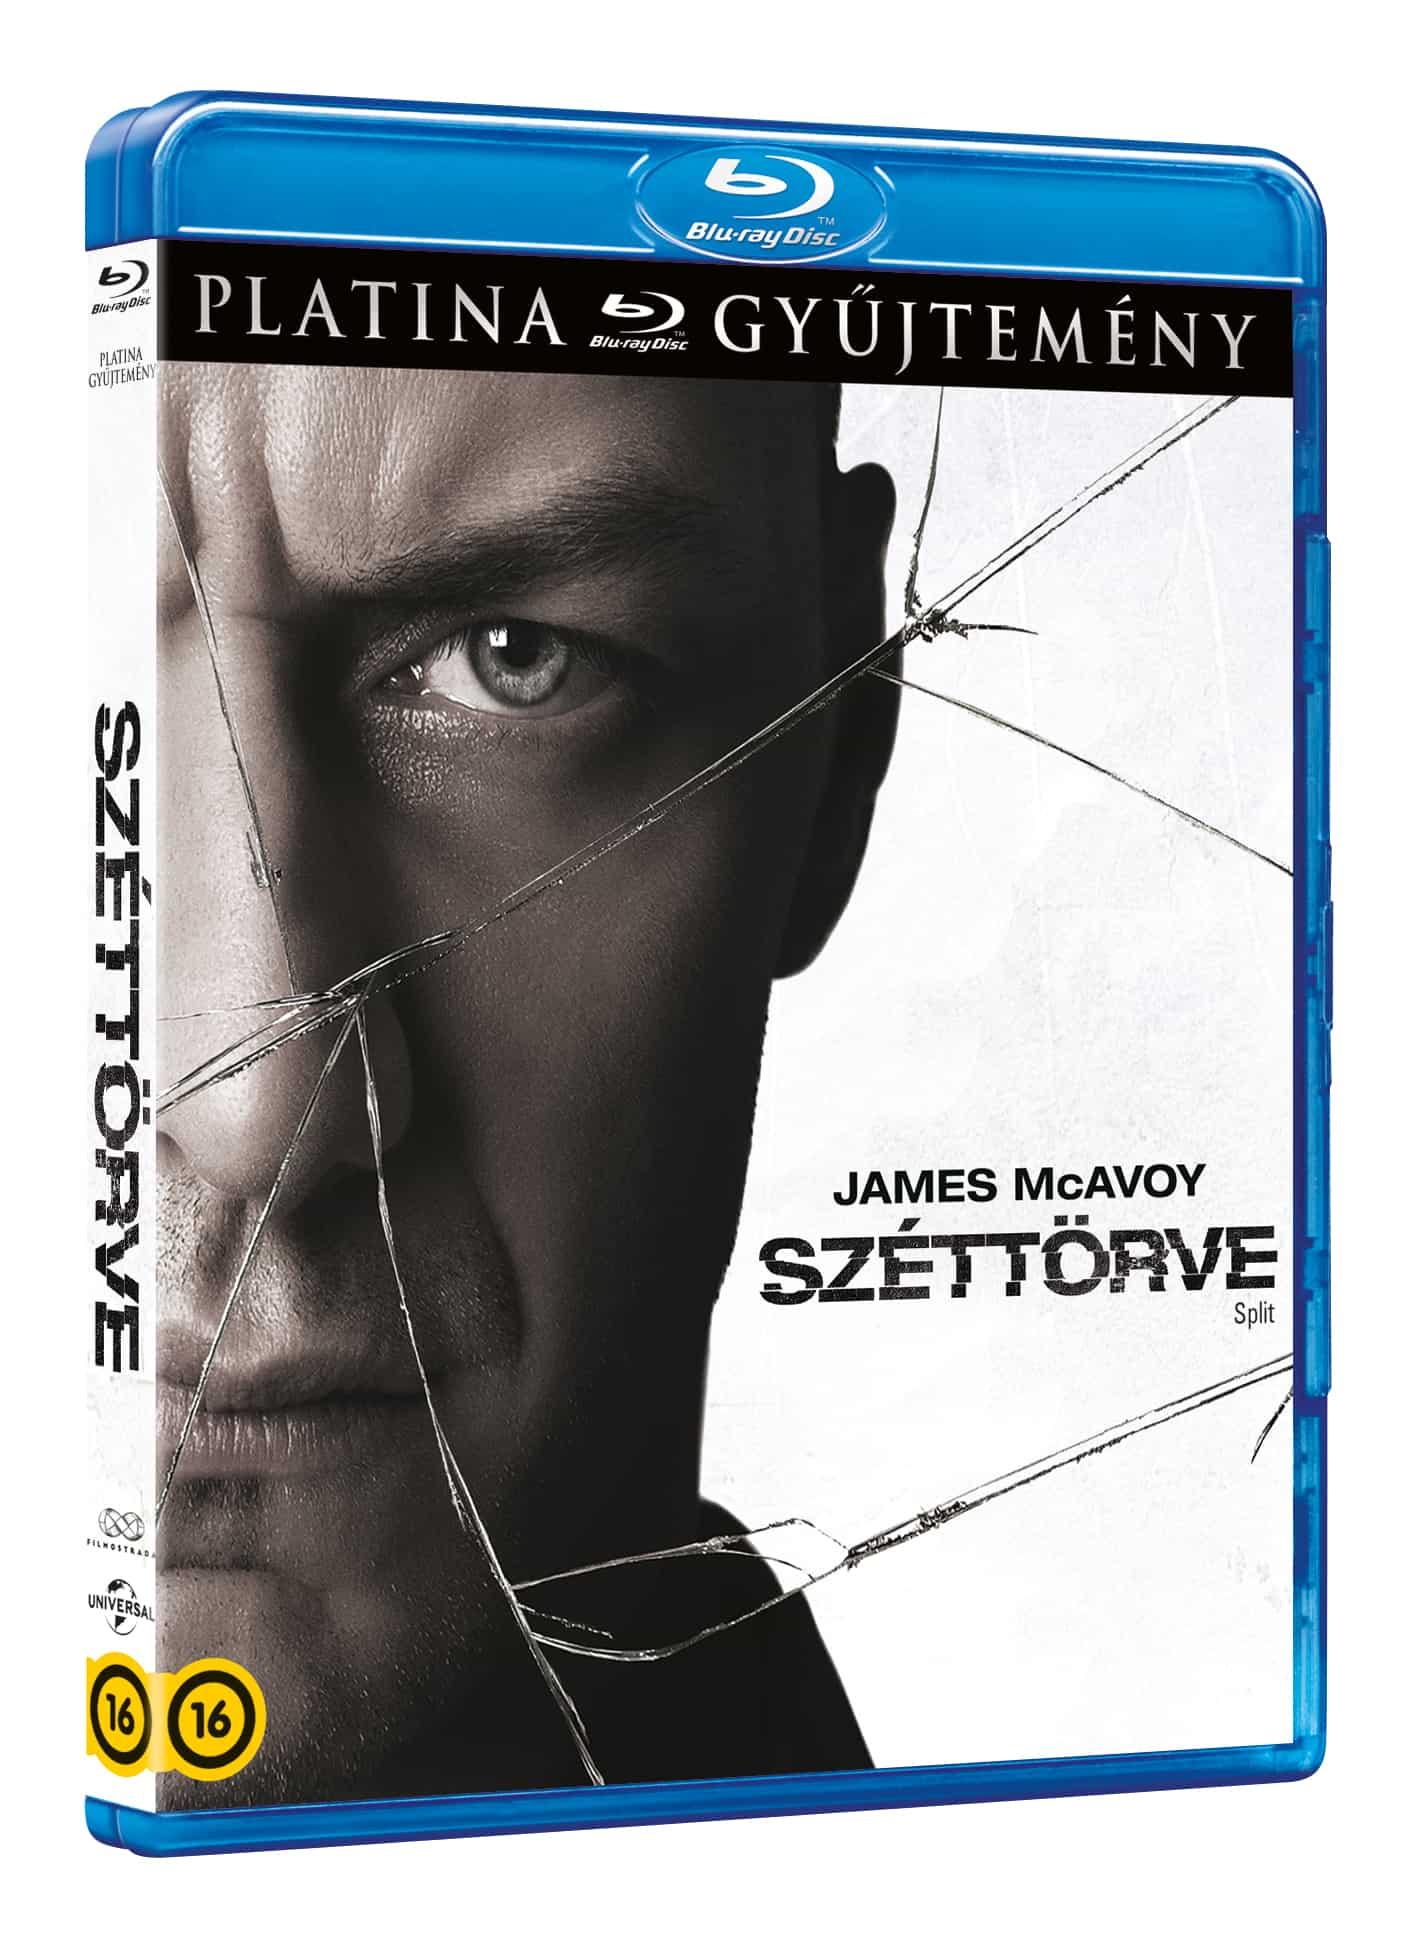 Széttörve (platina gyűjtemény) - Blu-ray